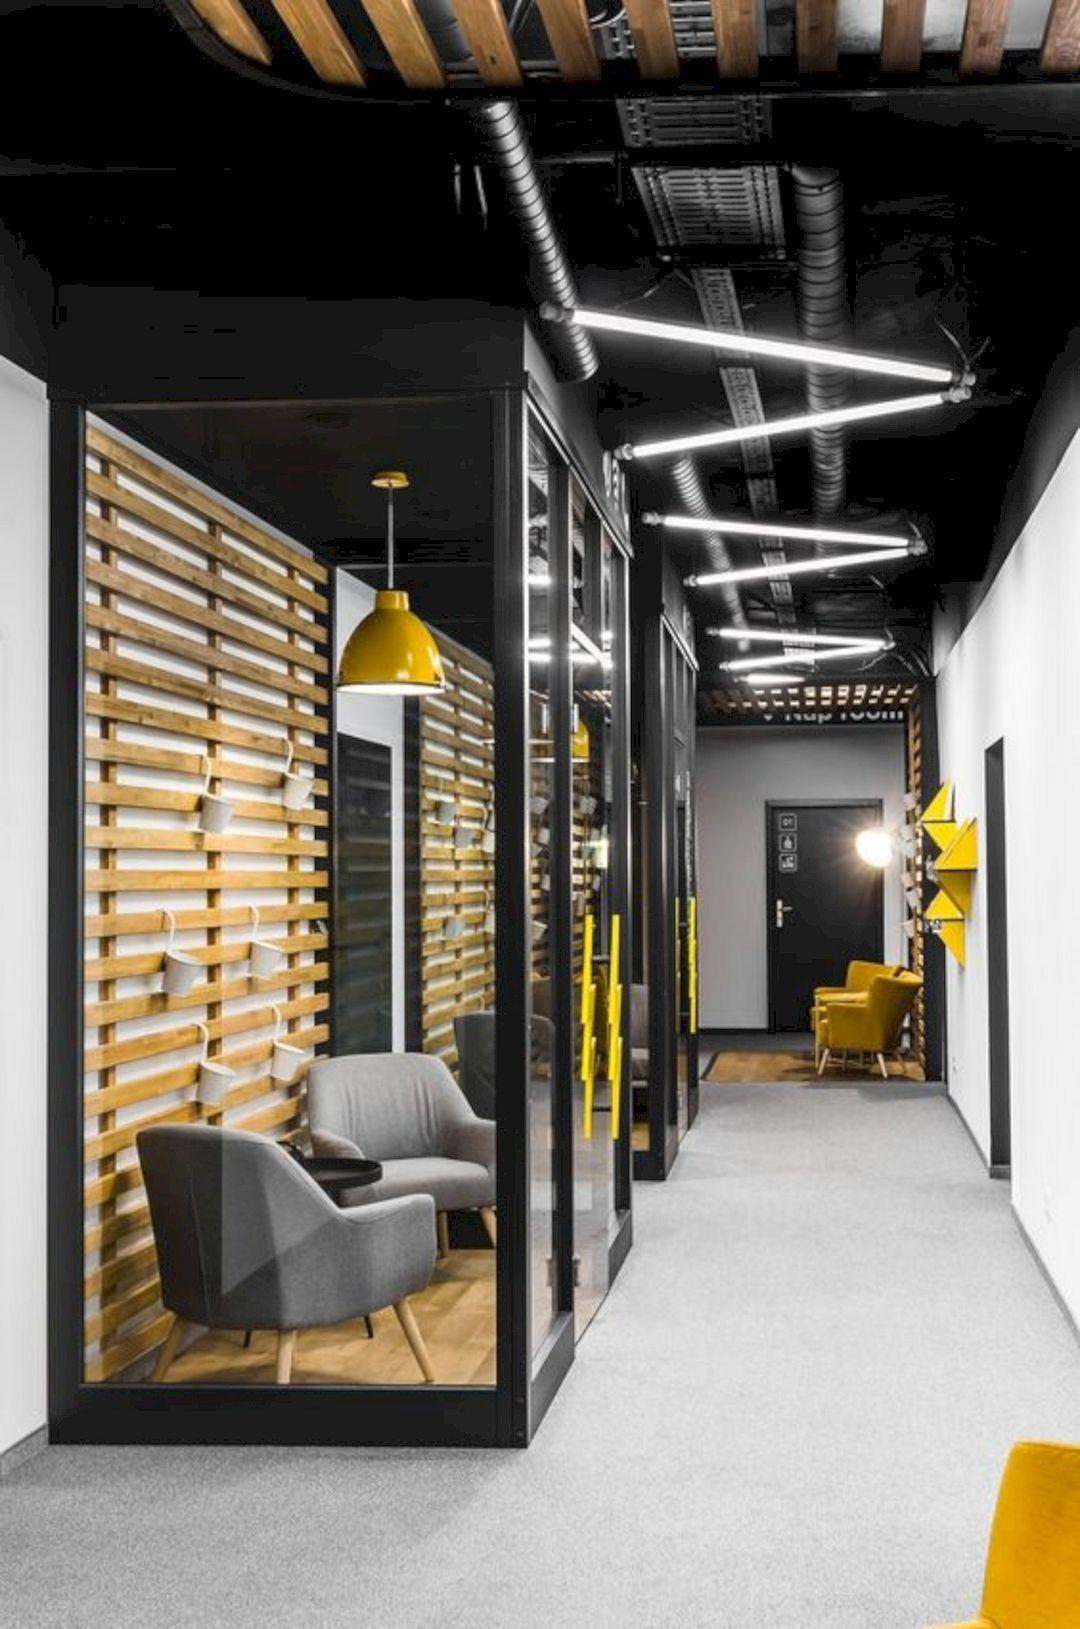 16 Office Interior Design Ideas Https://www.futuristarchitecture.com/30732